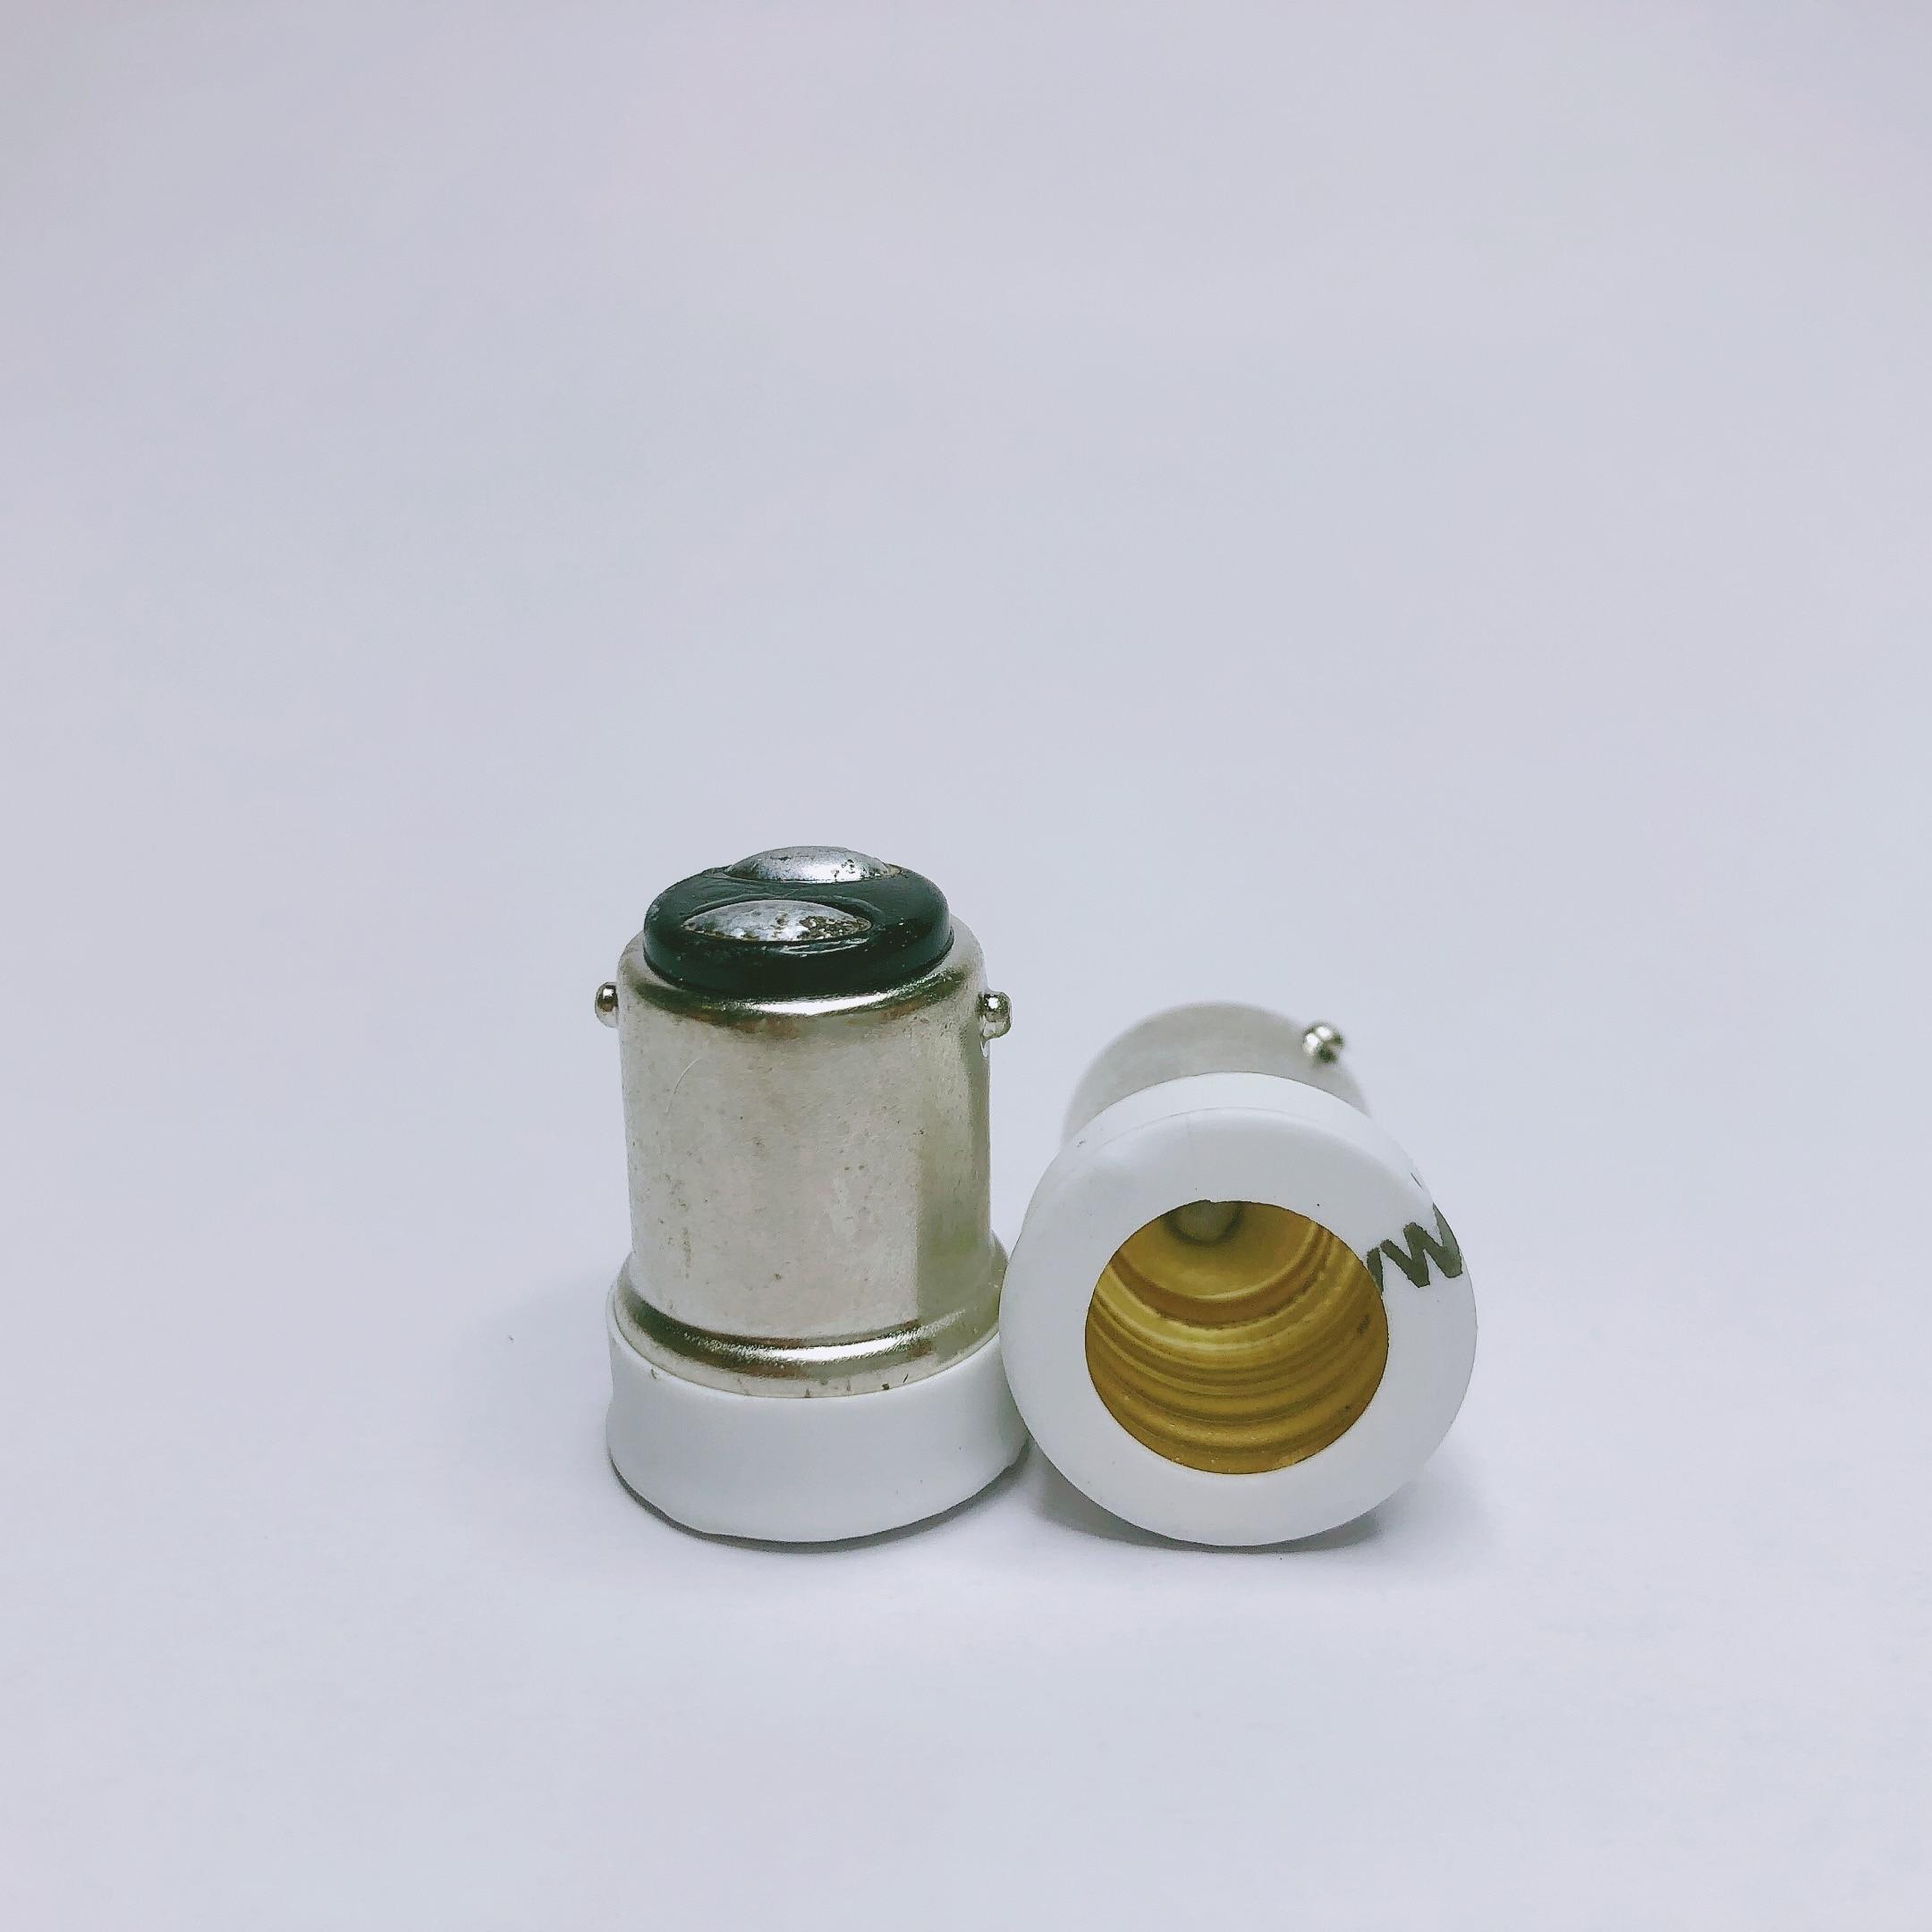 B15 Male to E14 Female Lamp Bulb Socket Light Extender Adaptor Converter Holder Drop Ship Support(China)